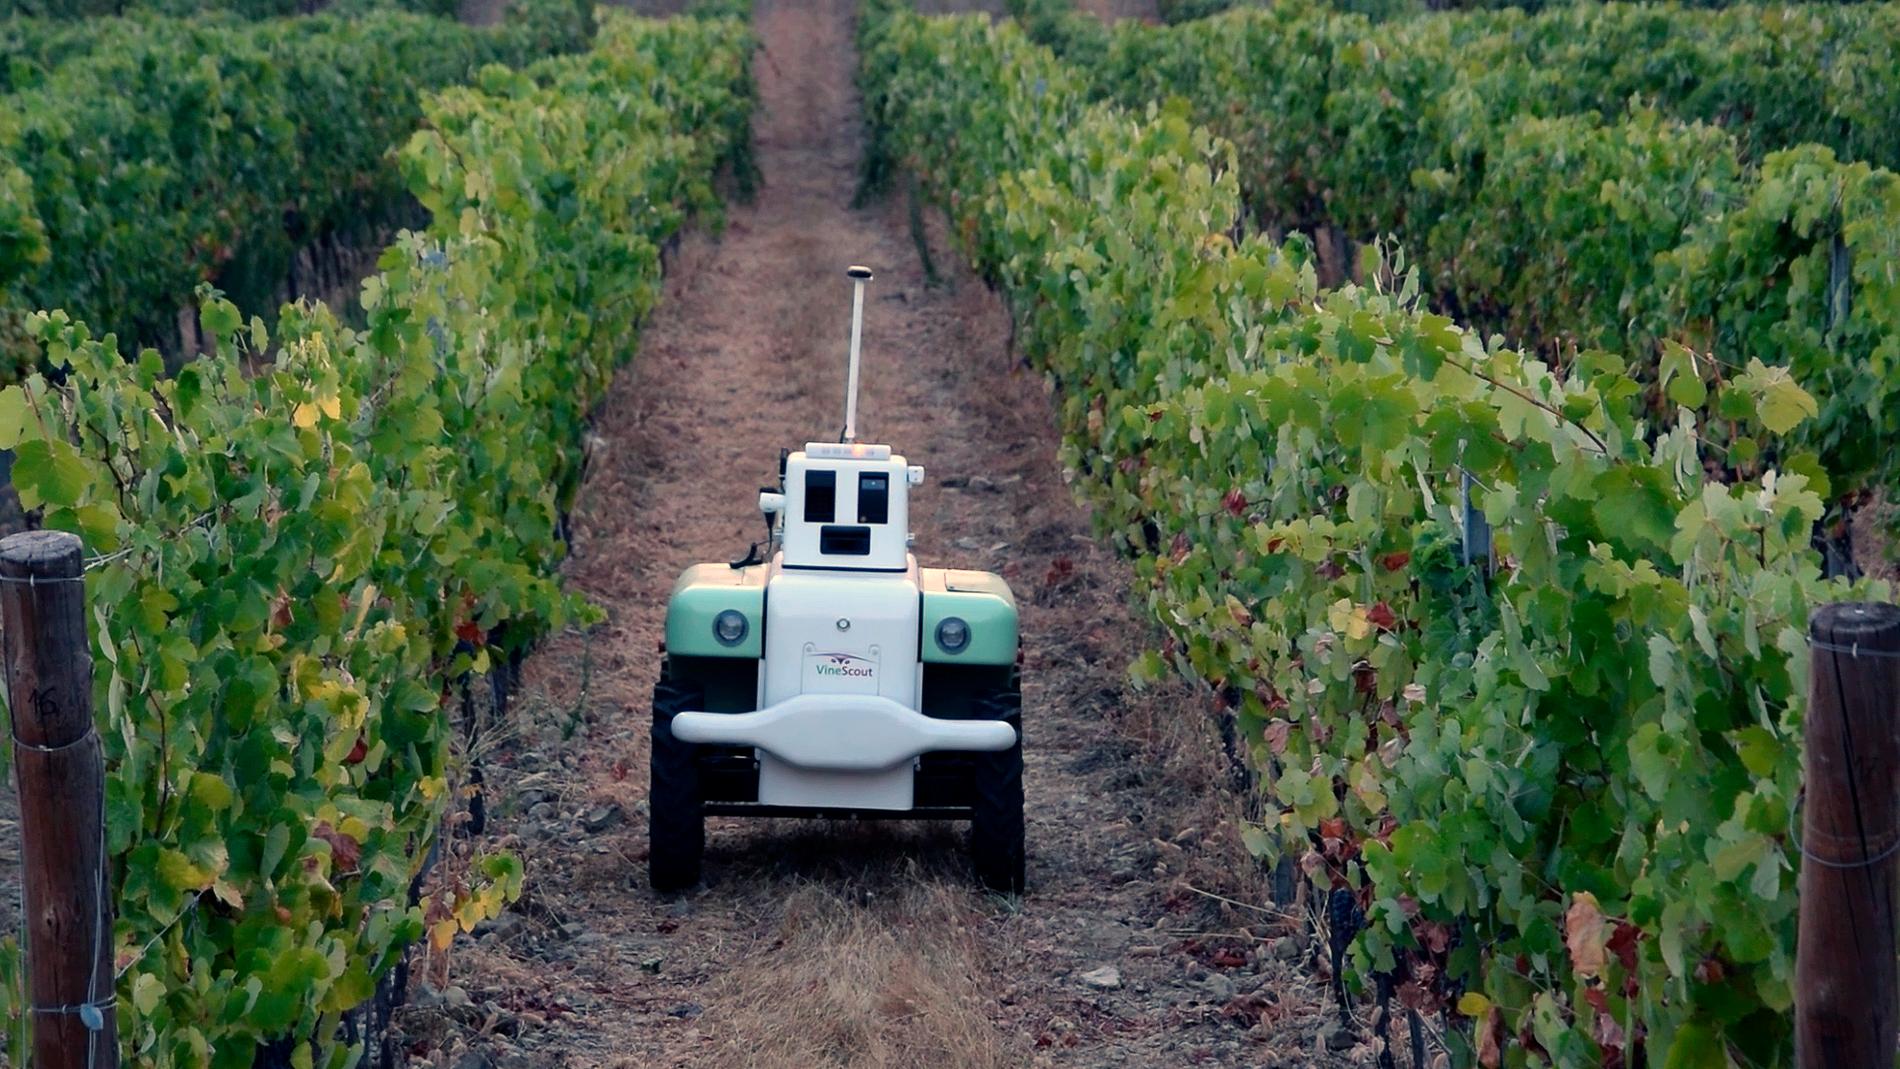 Robot moviéndose entre la vides